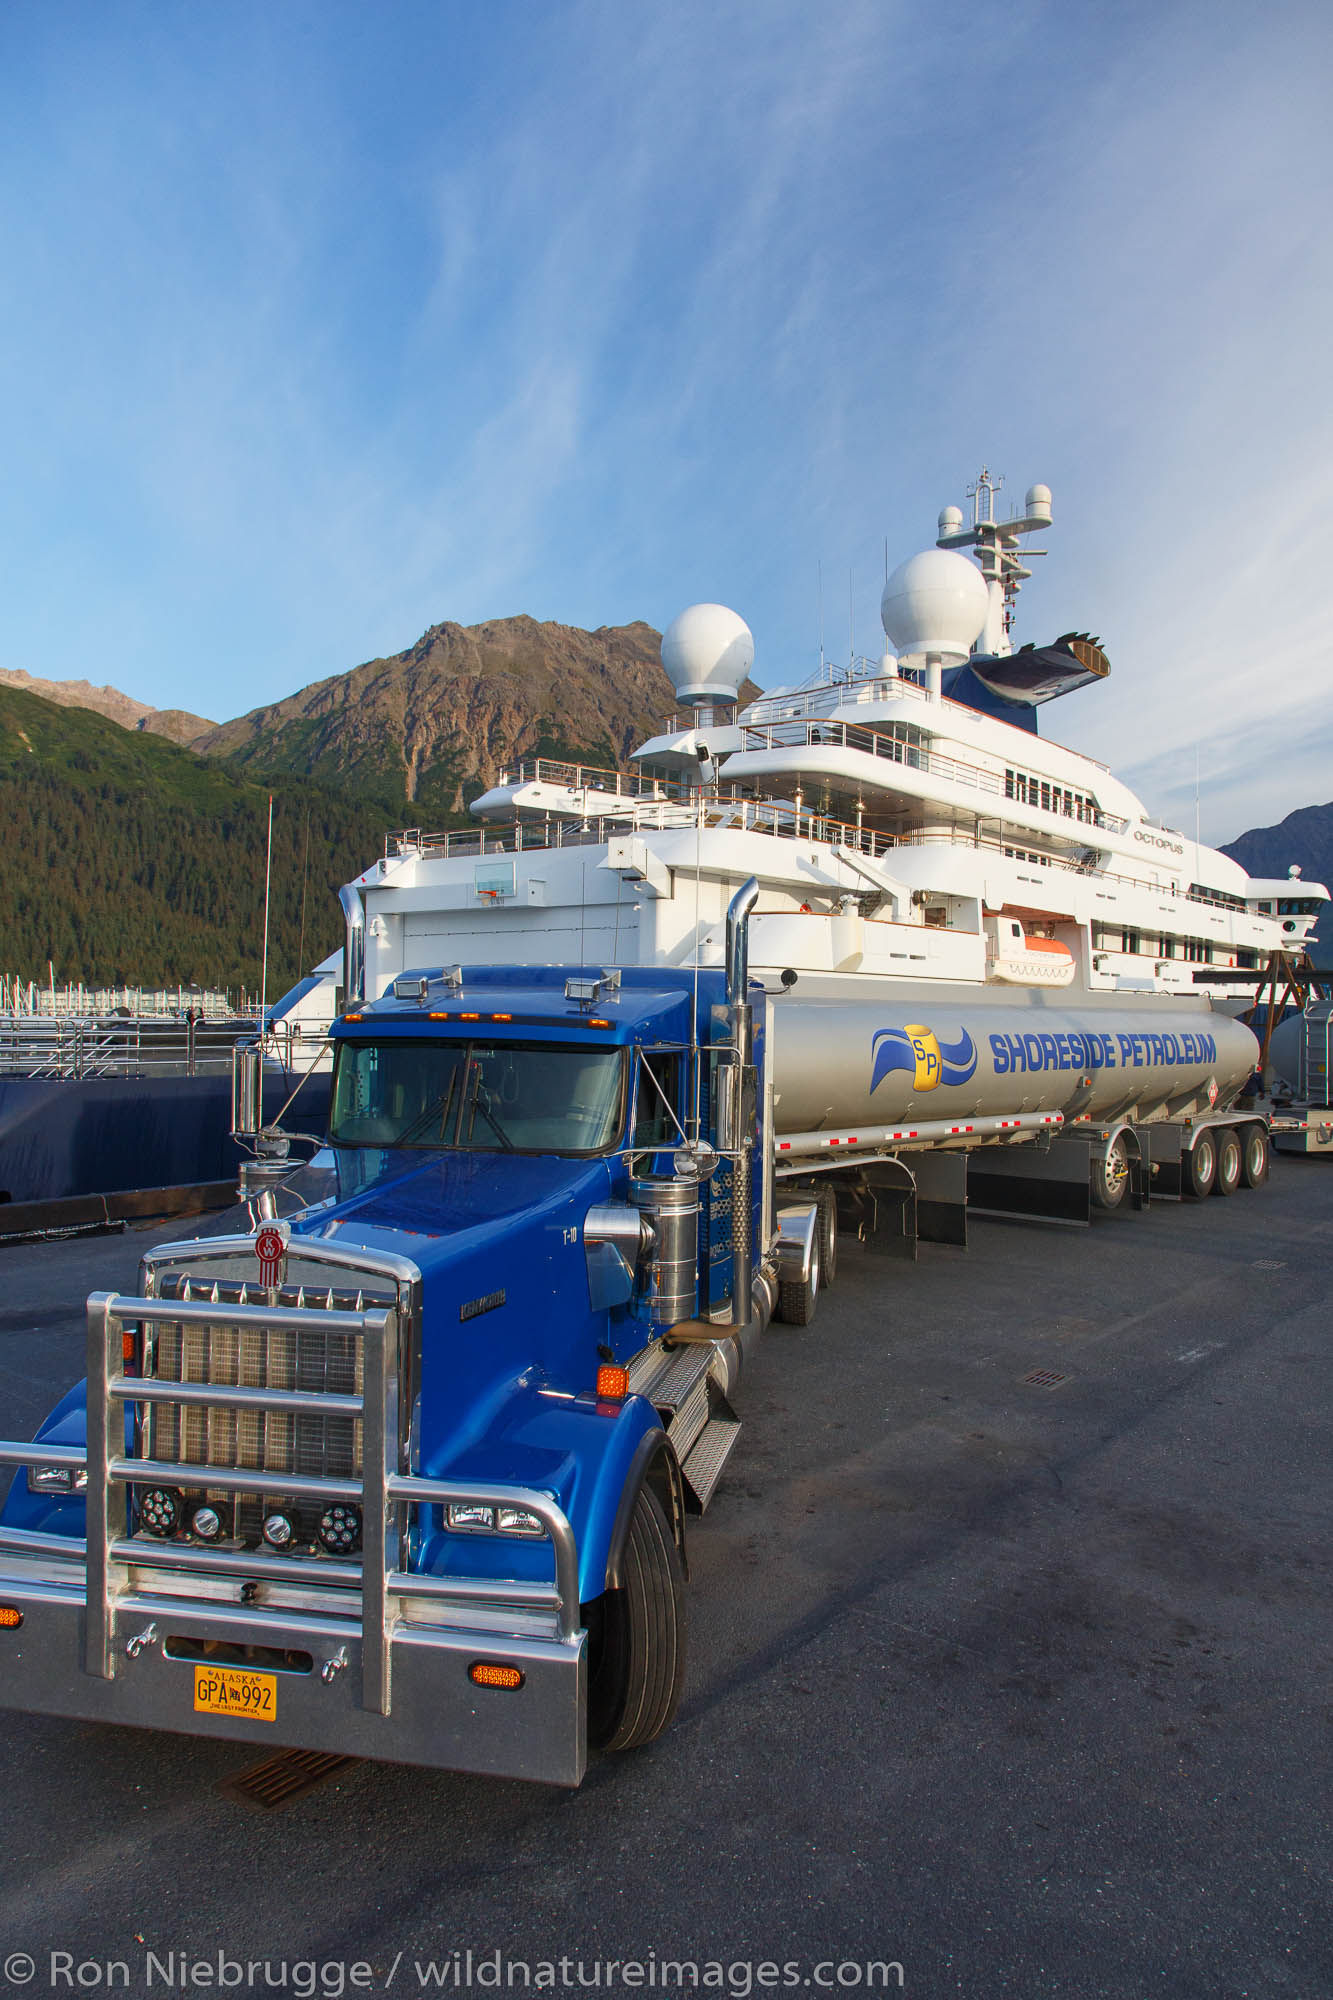 Shoreside Petroleum fueling the Octopus, Seward, Alaska.